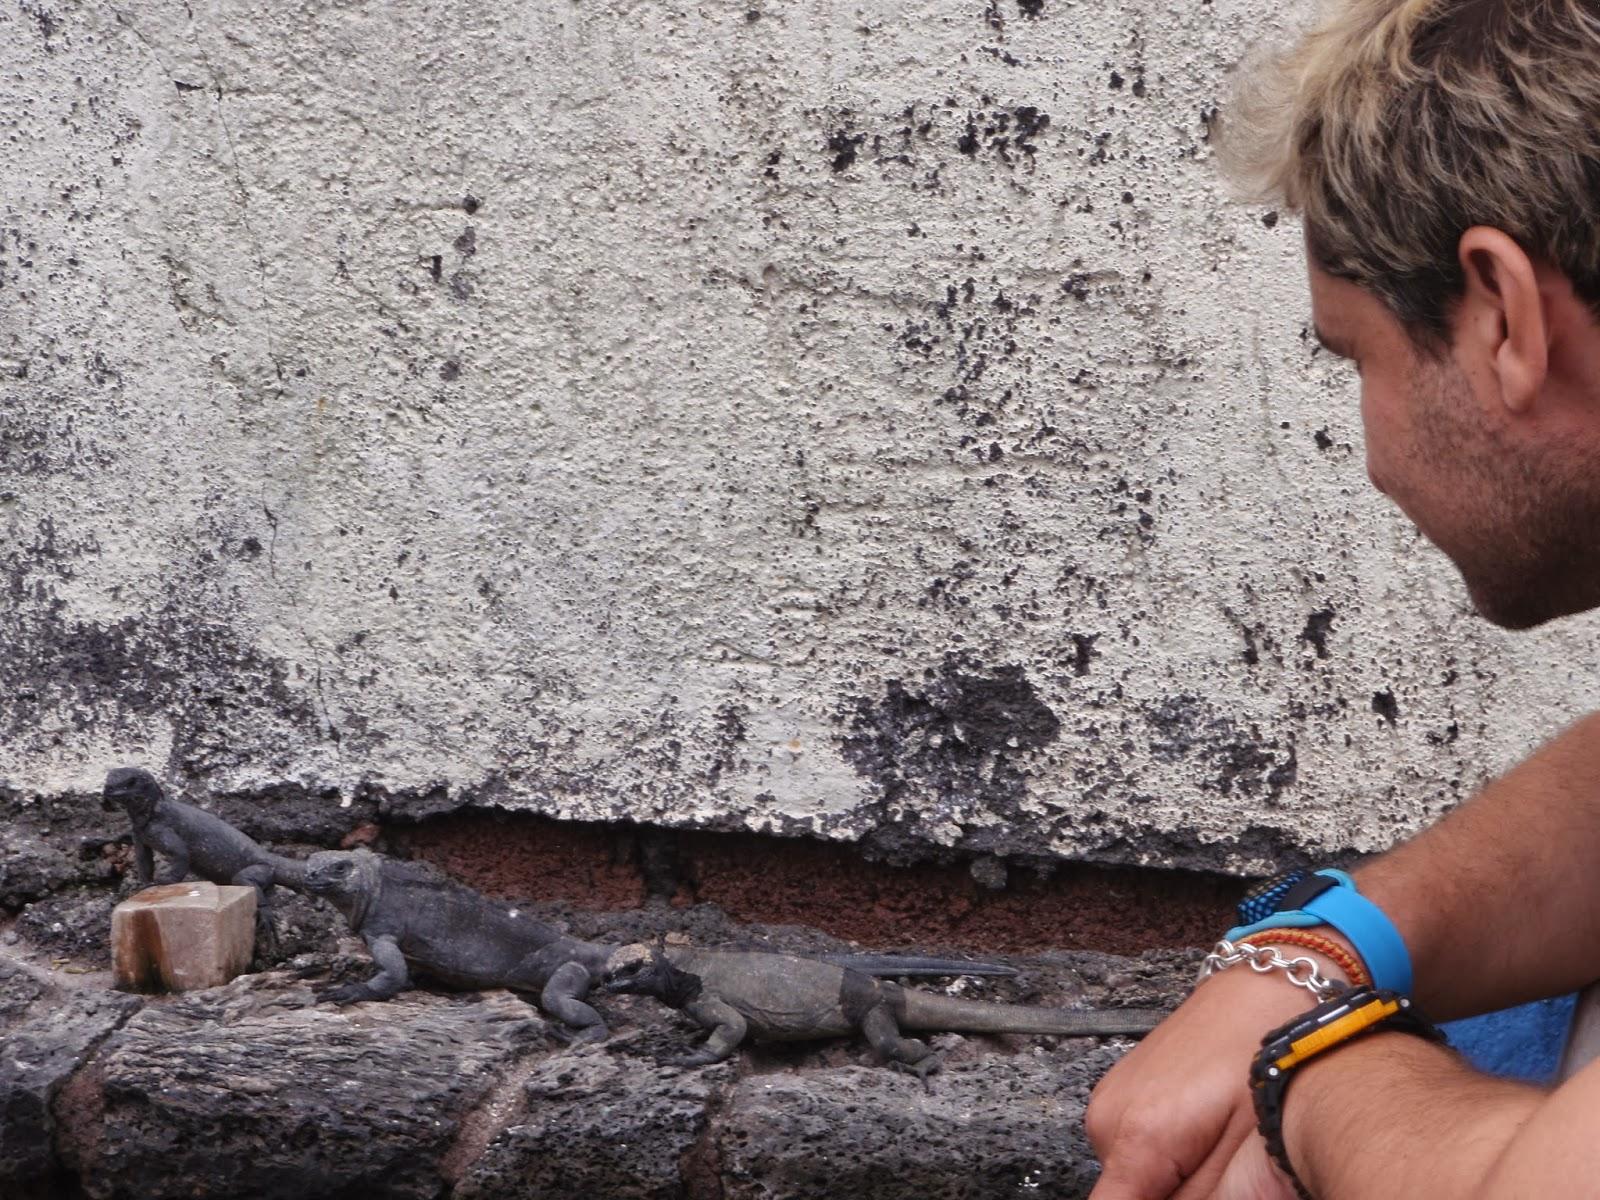 pequeñas iguanas